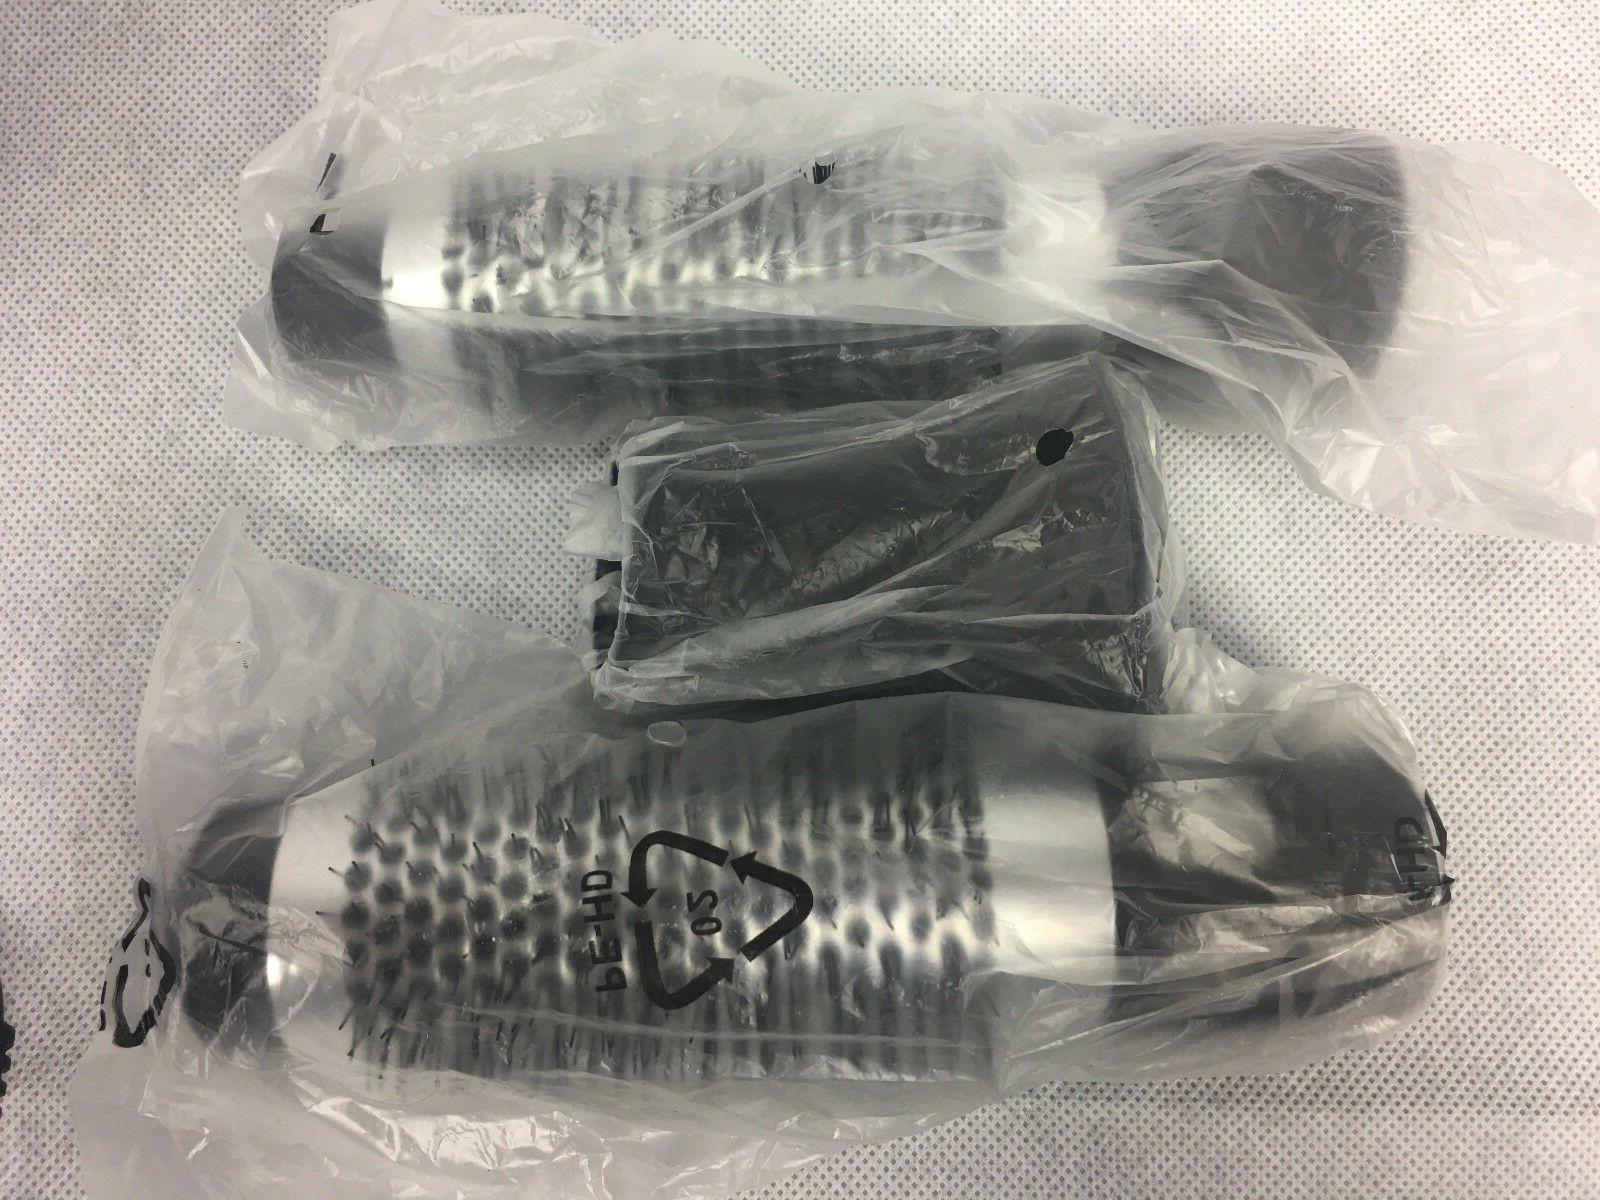 REVLON heat dryer brush incl. 4PC air kit